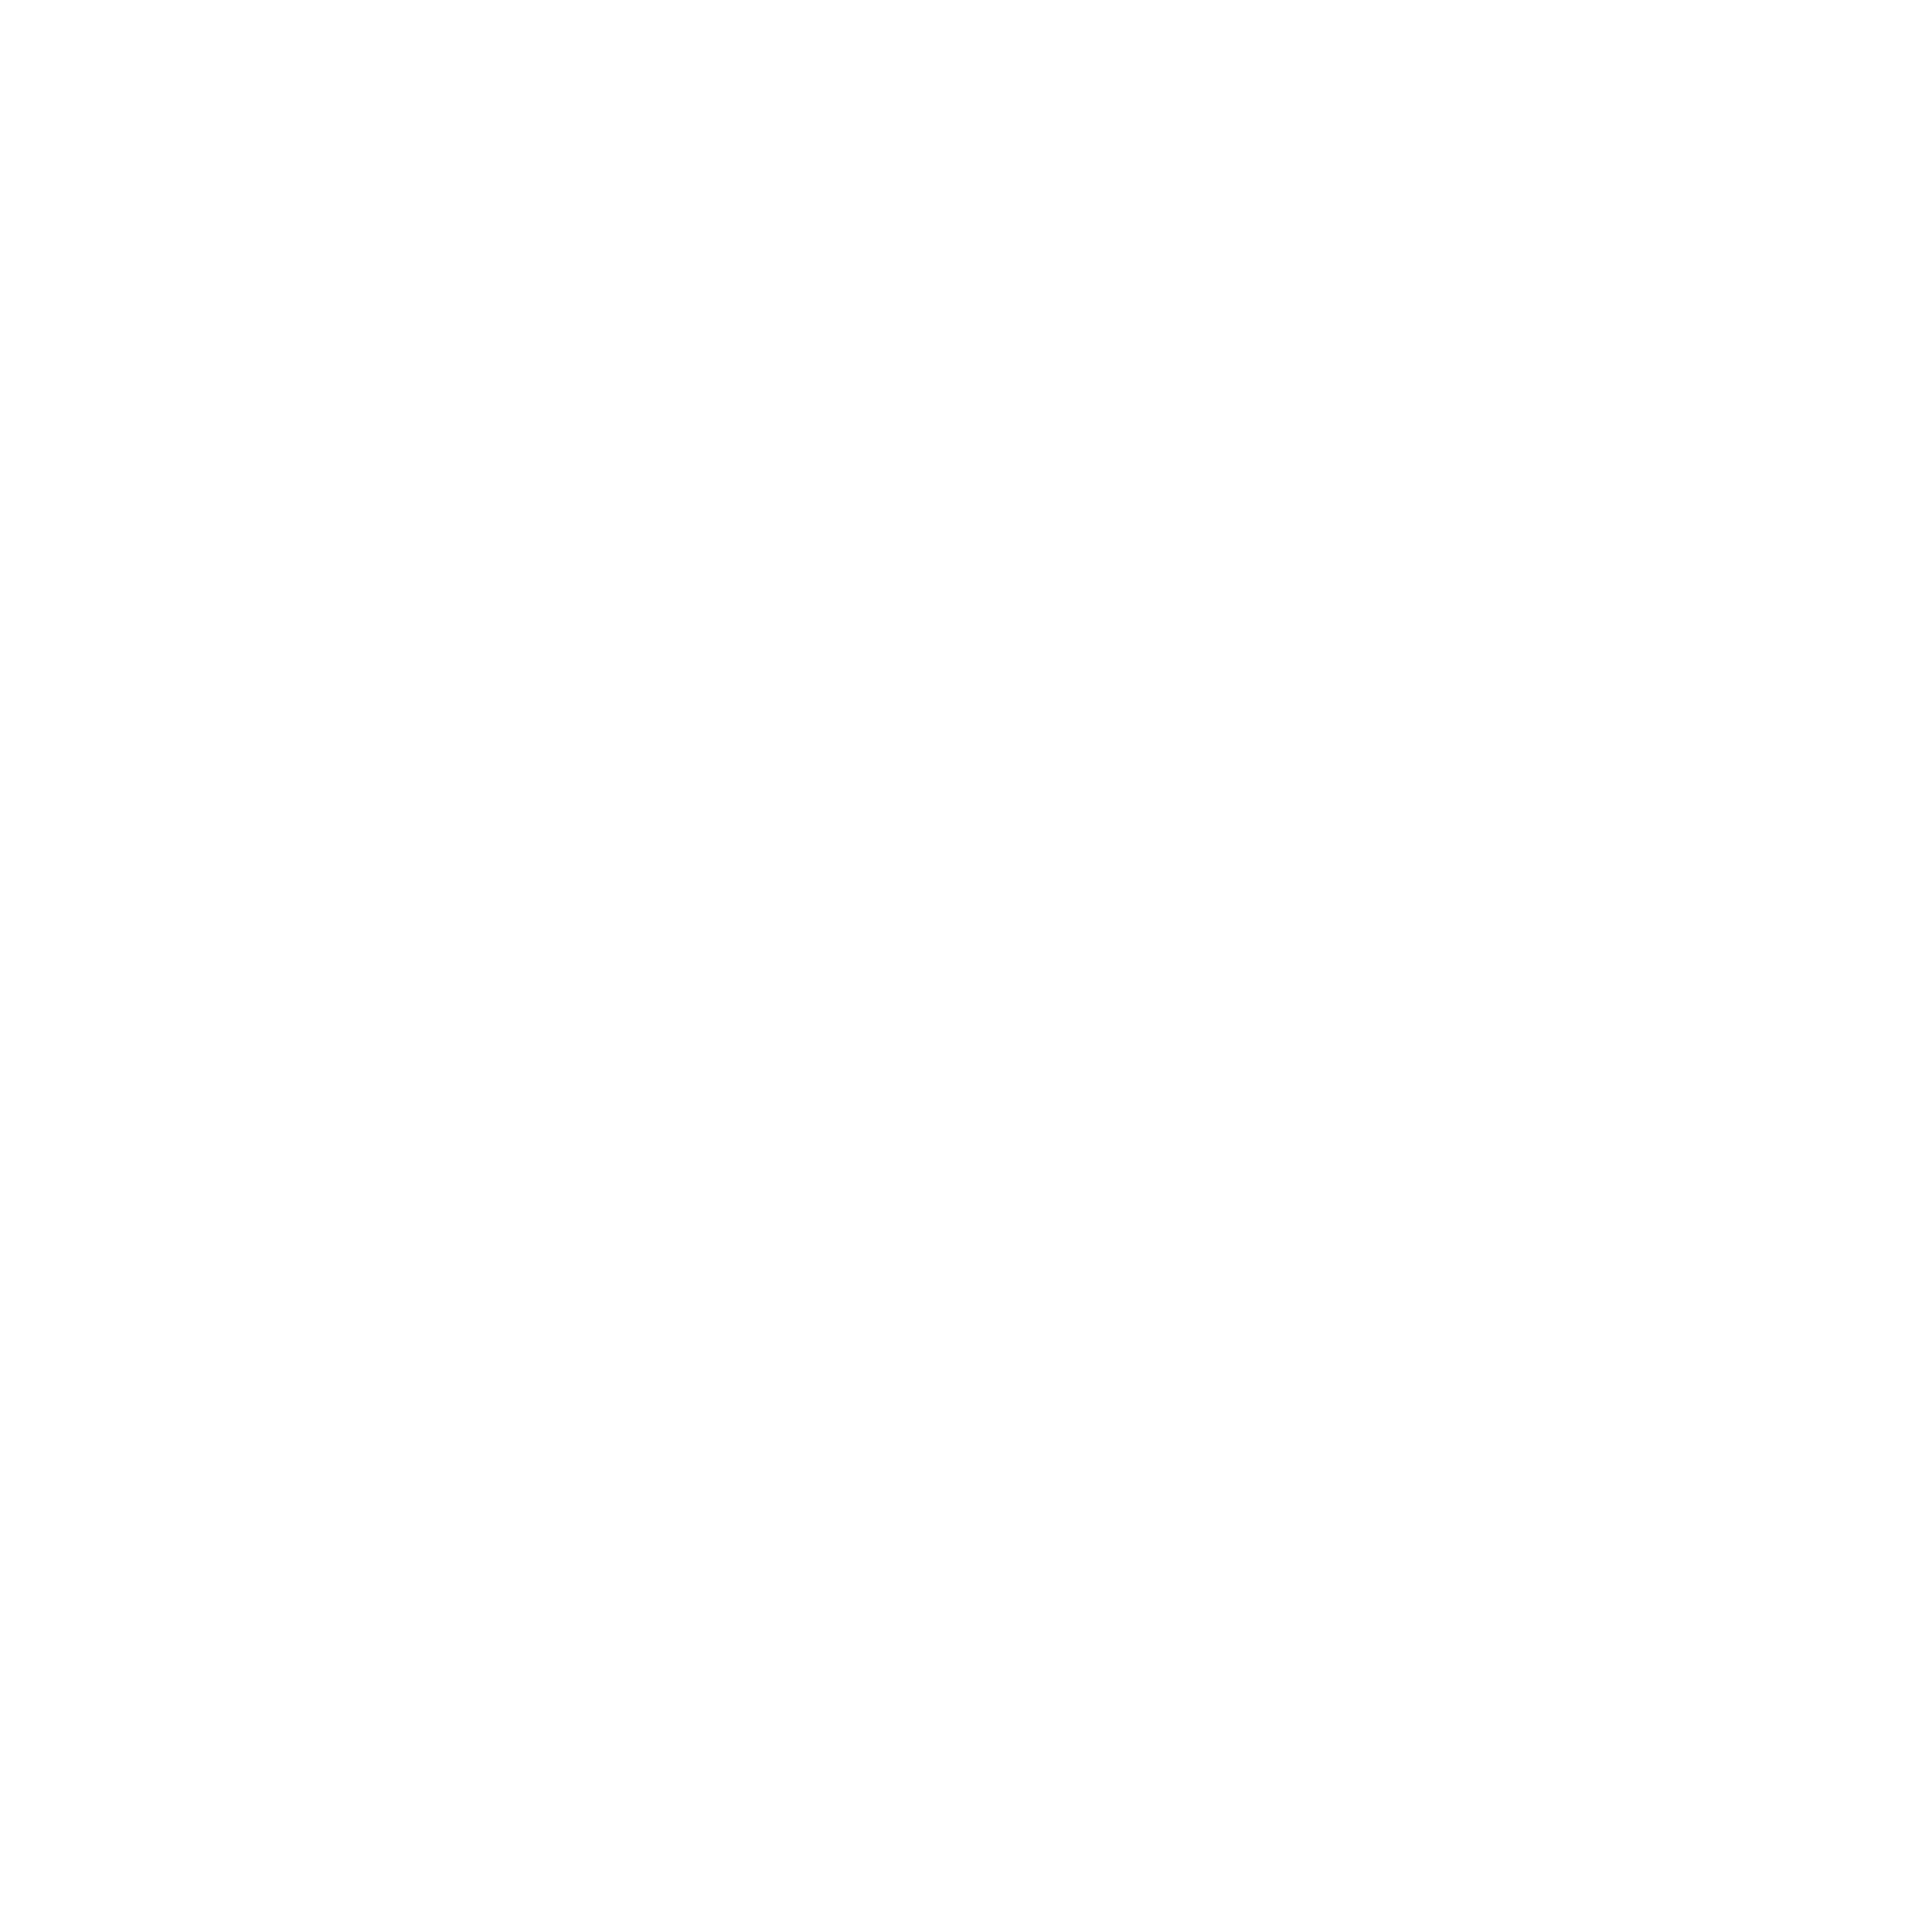 Dr. Adam Perlman